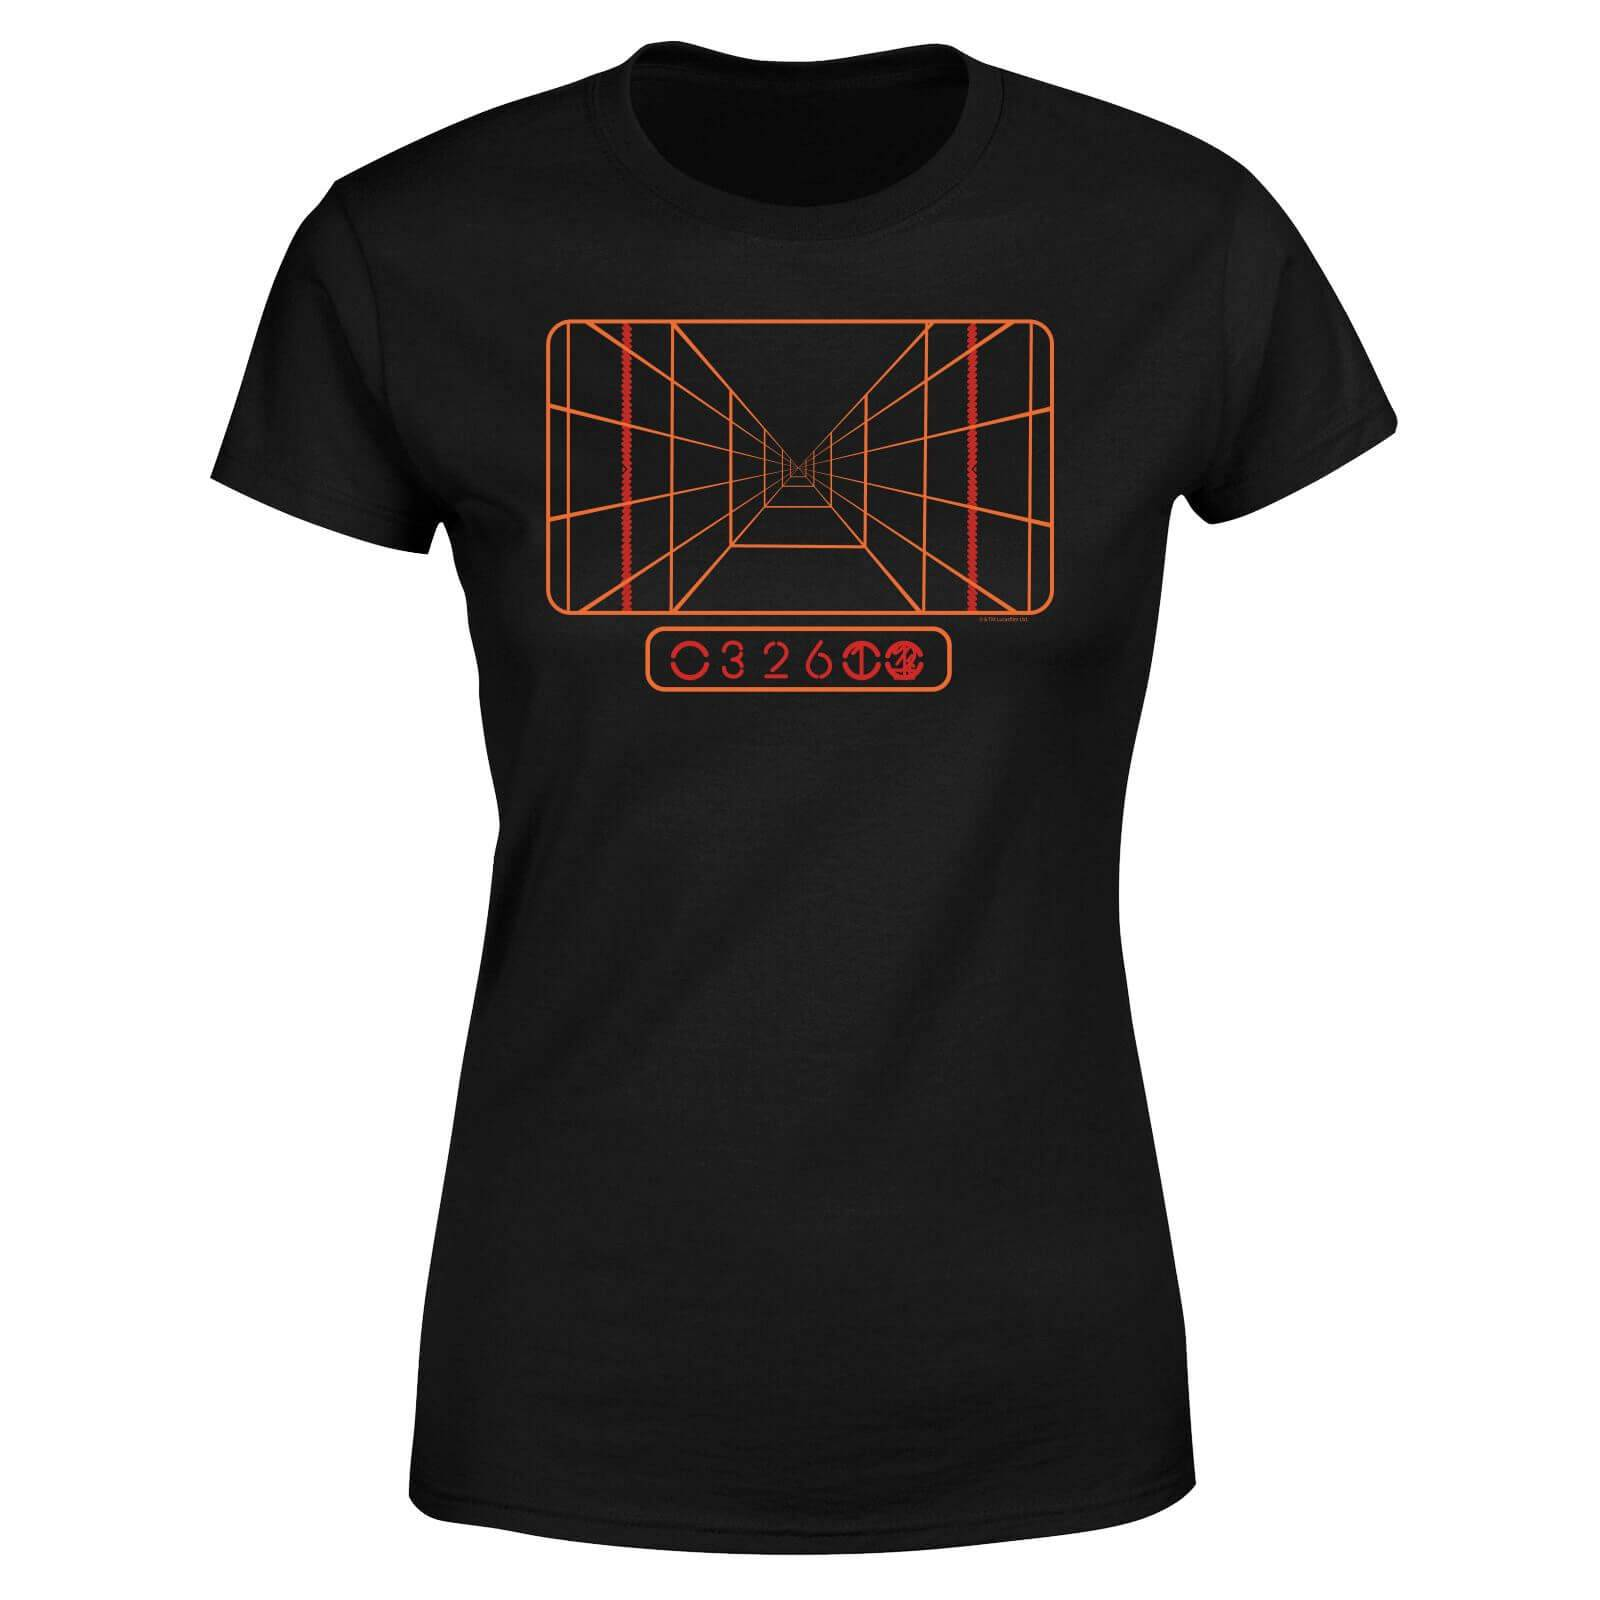 Star Wars Targeting Computer Women's T-Shirt - Black - L - Black